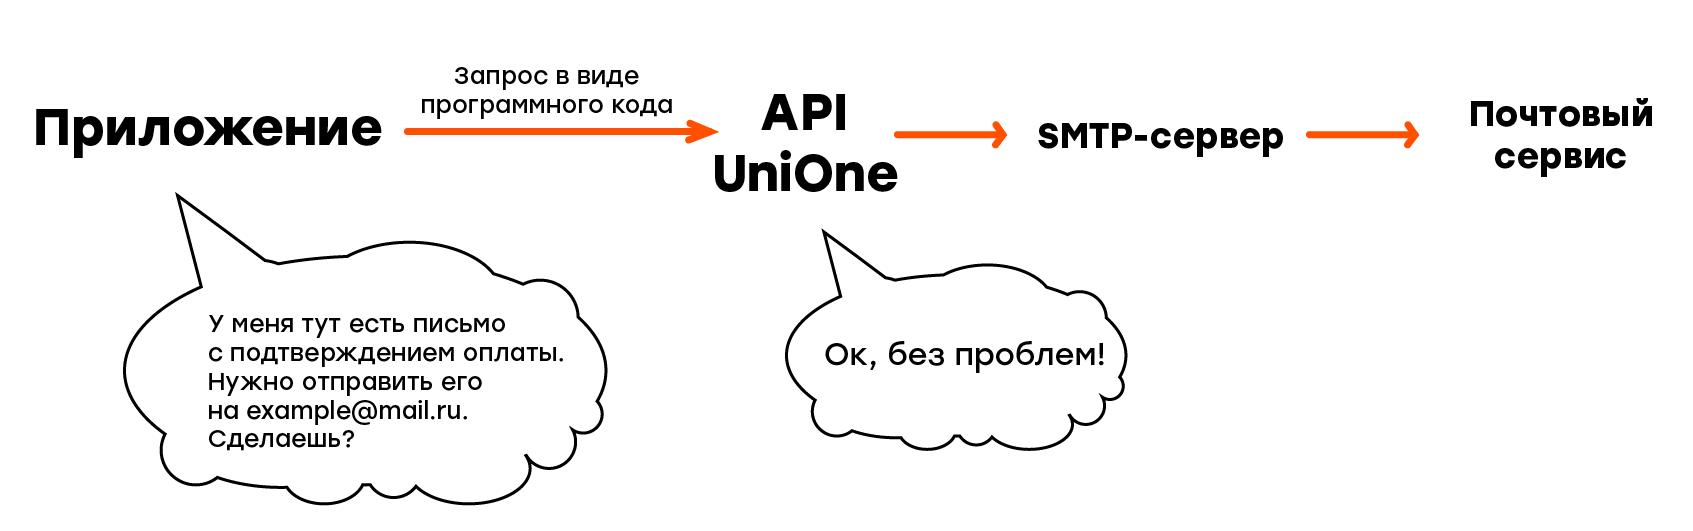 Как работает API